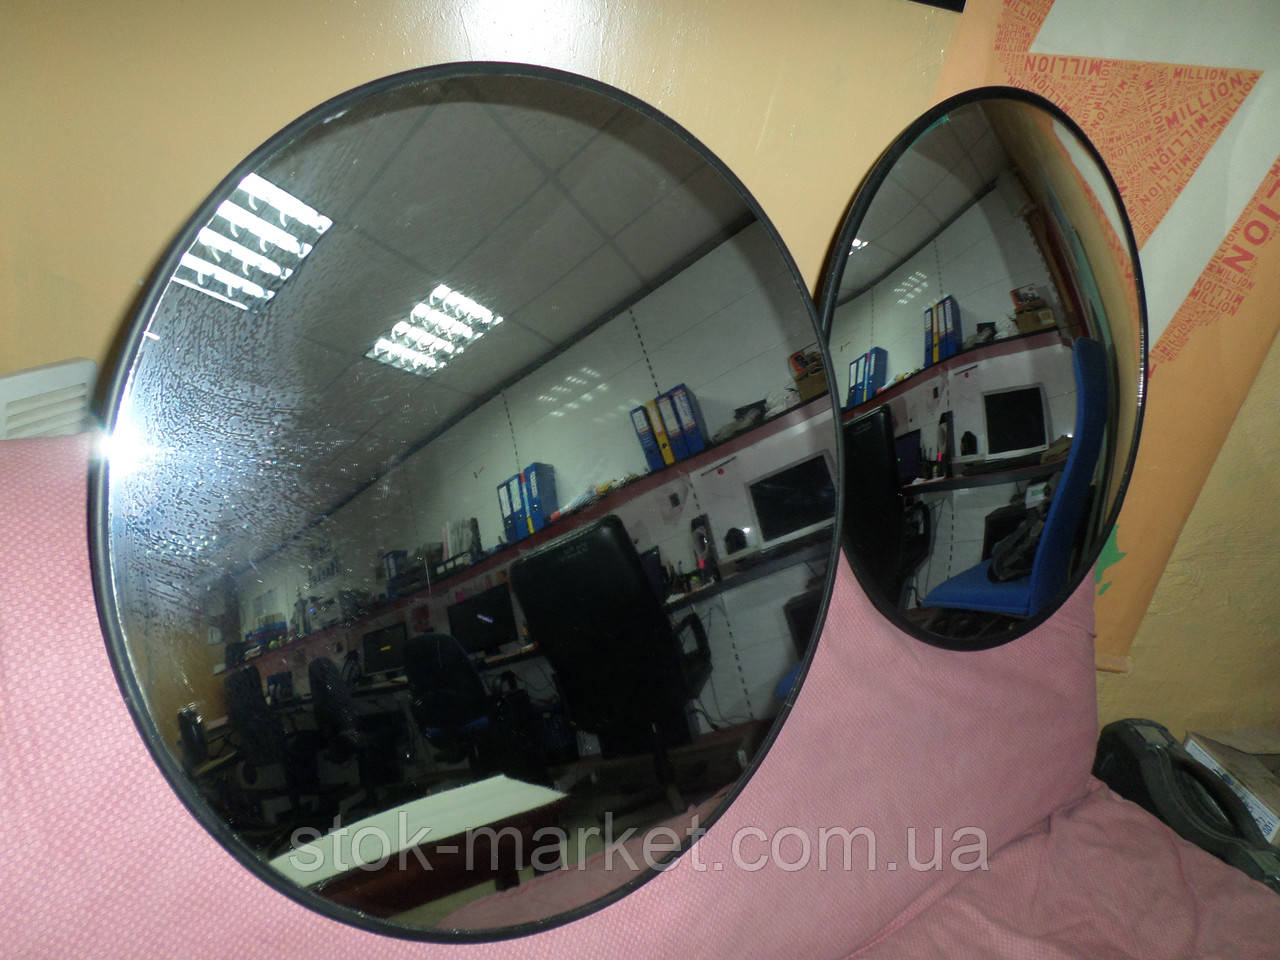 Дзеркало оглядове 600 мм, б/в, дзеркала противо кражные б, сферичні дзеркала безпеки б/у.